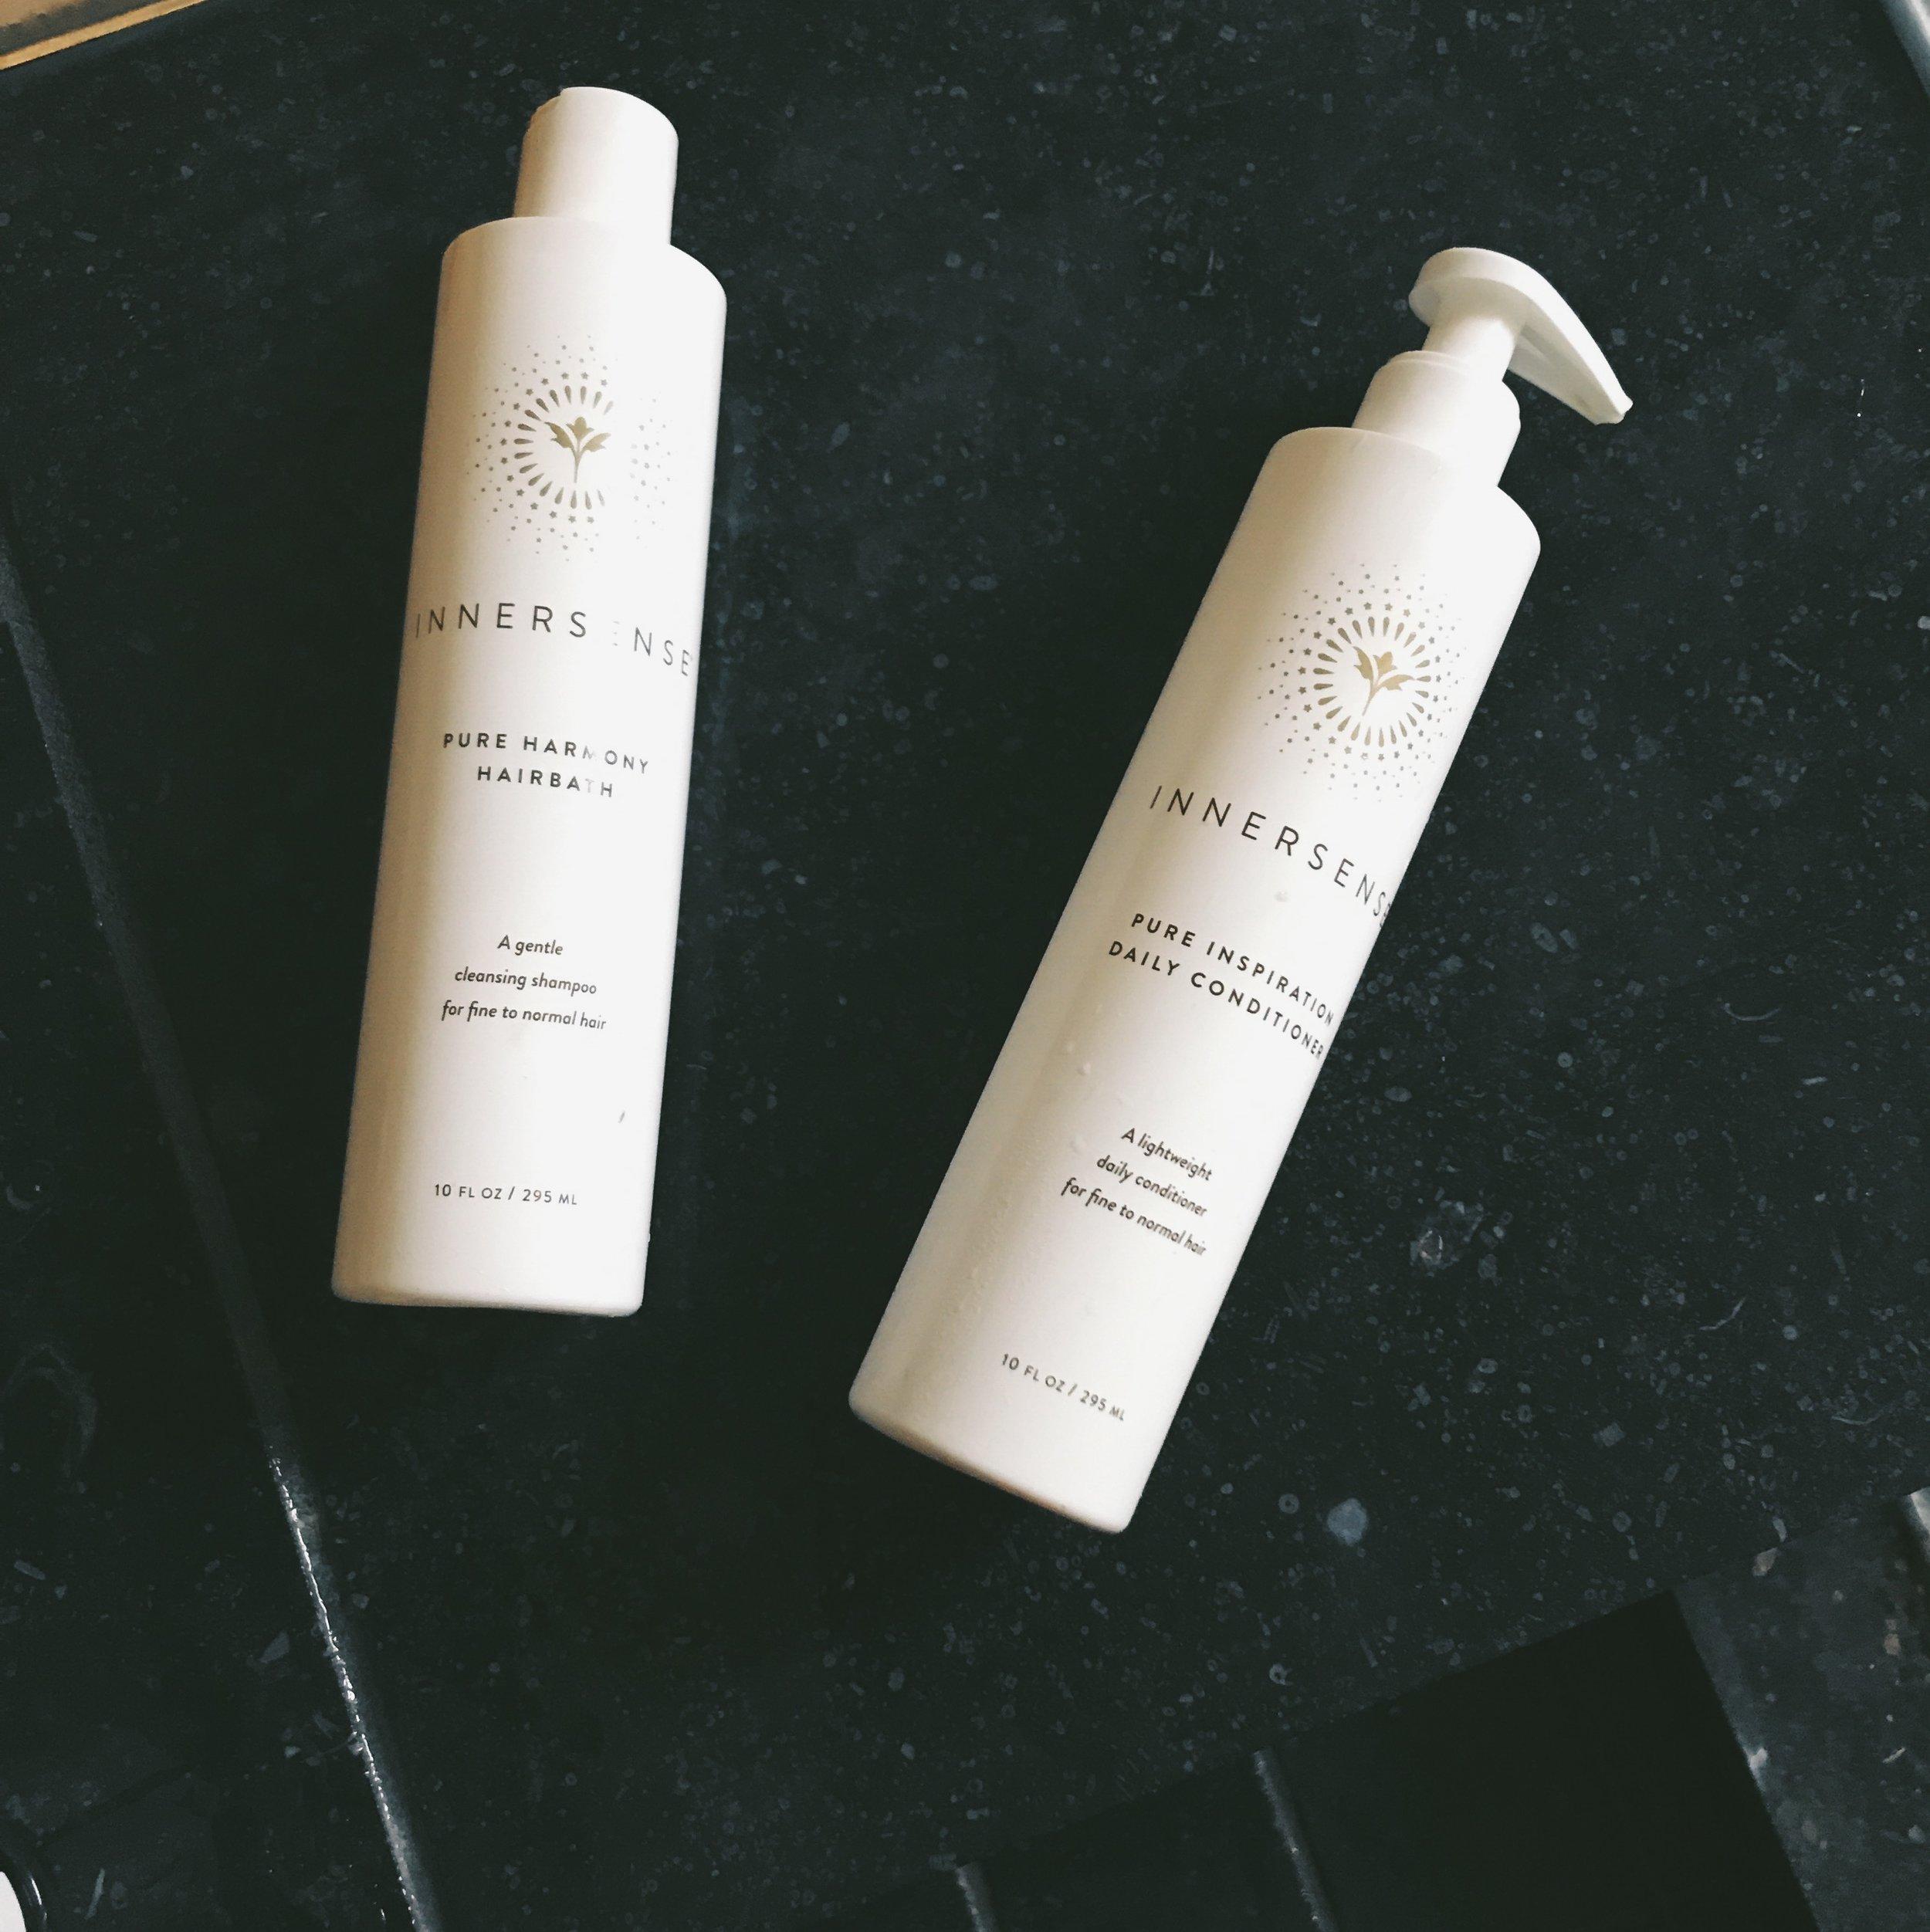 innersense nontoxic shampoo conditioner